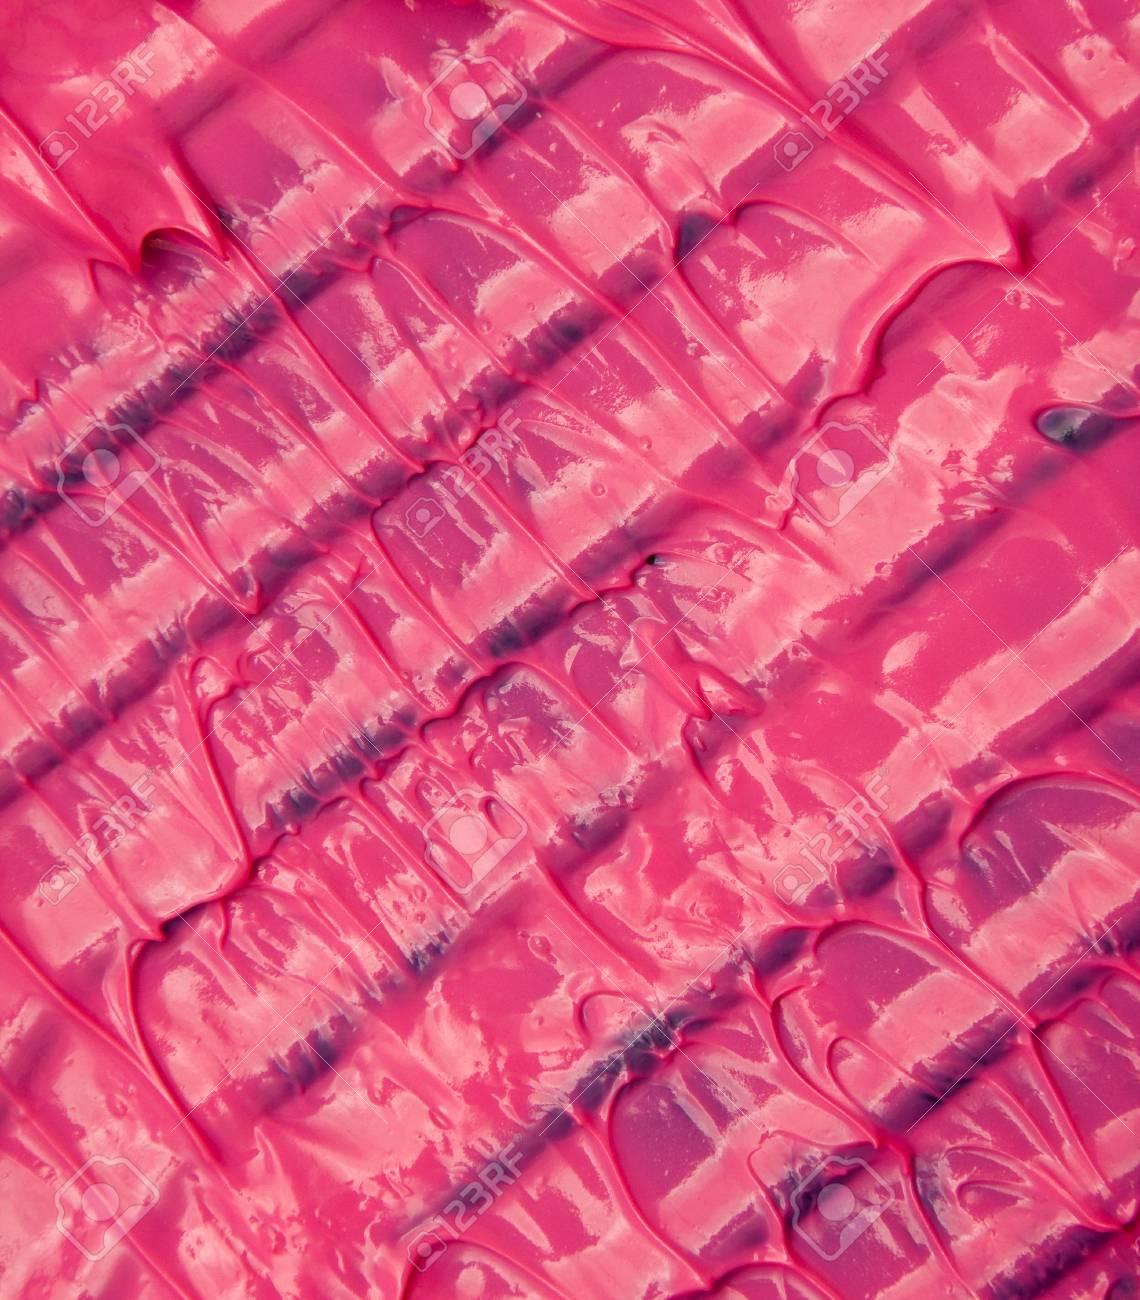 Wet purple paint drips on tray Stock Photo - 10658198